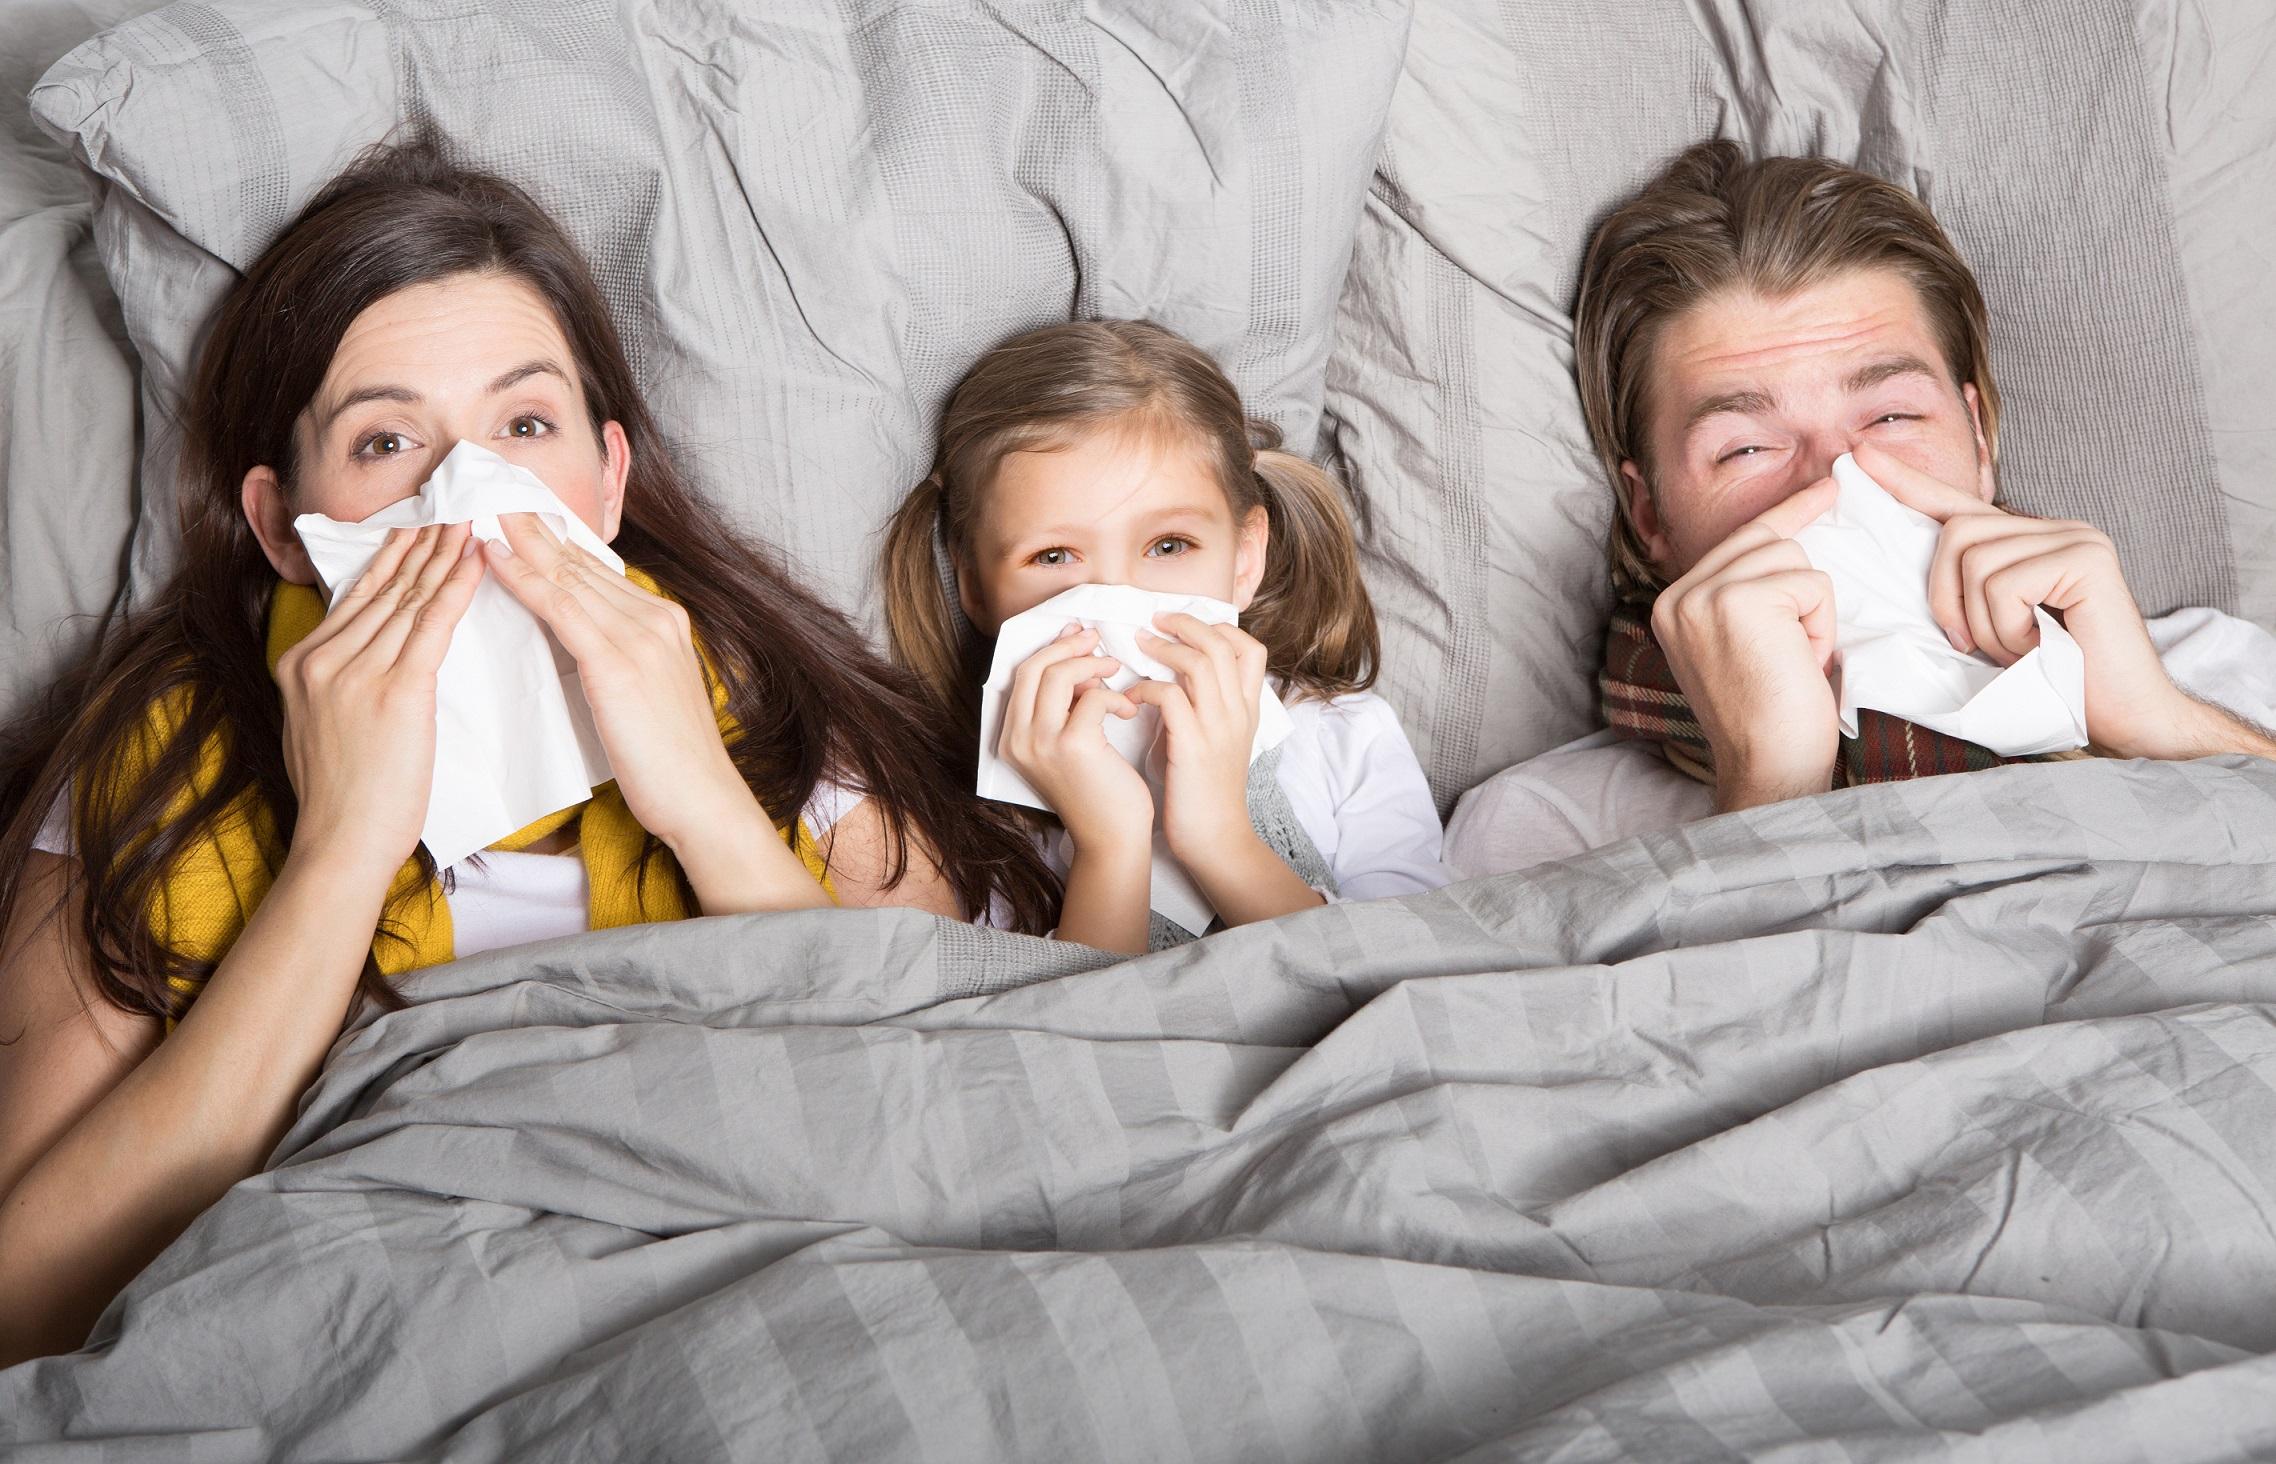 Schwächen die COVID-19-Schutzmaßnahmen unser Immunsystem? - Heilpraxisnet.de